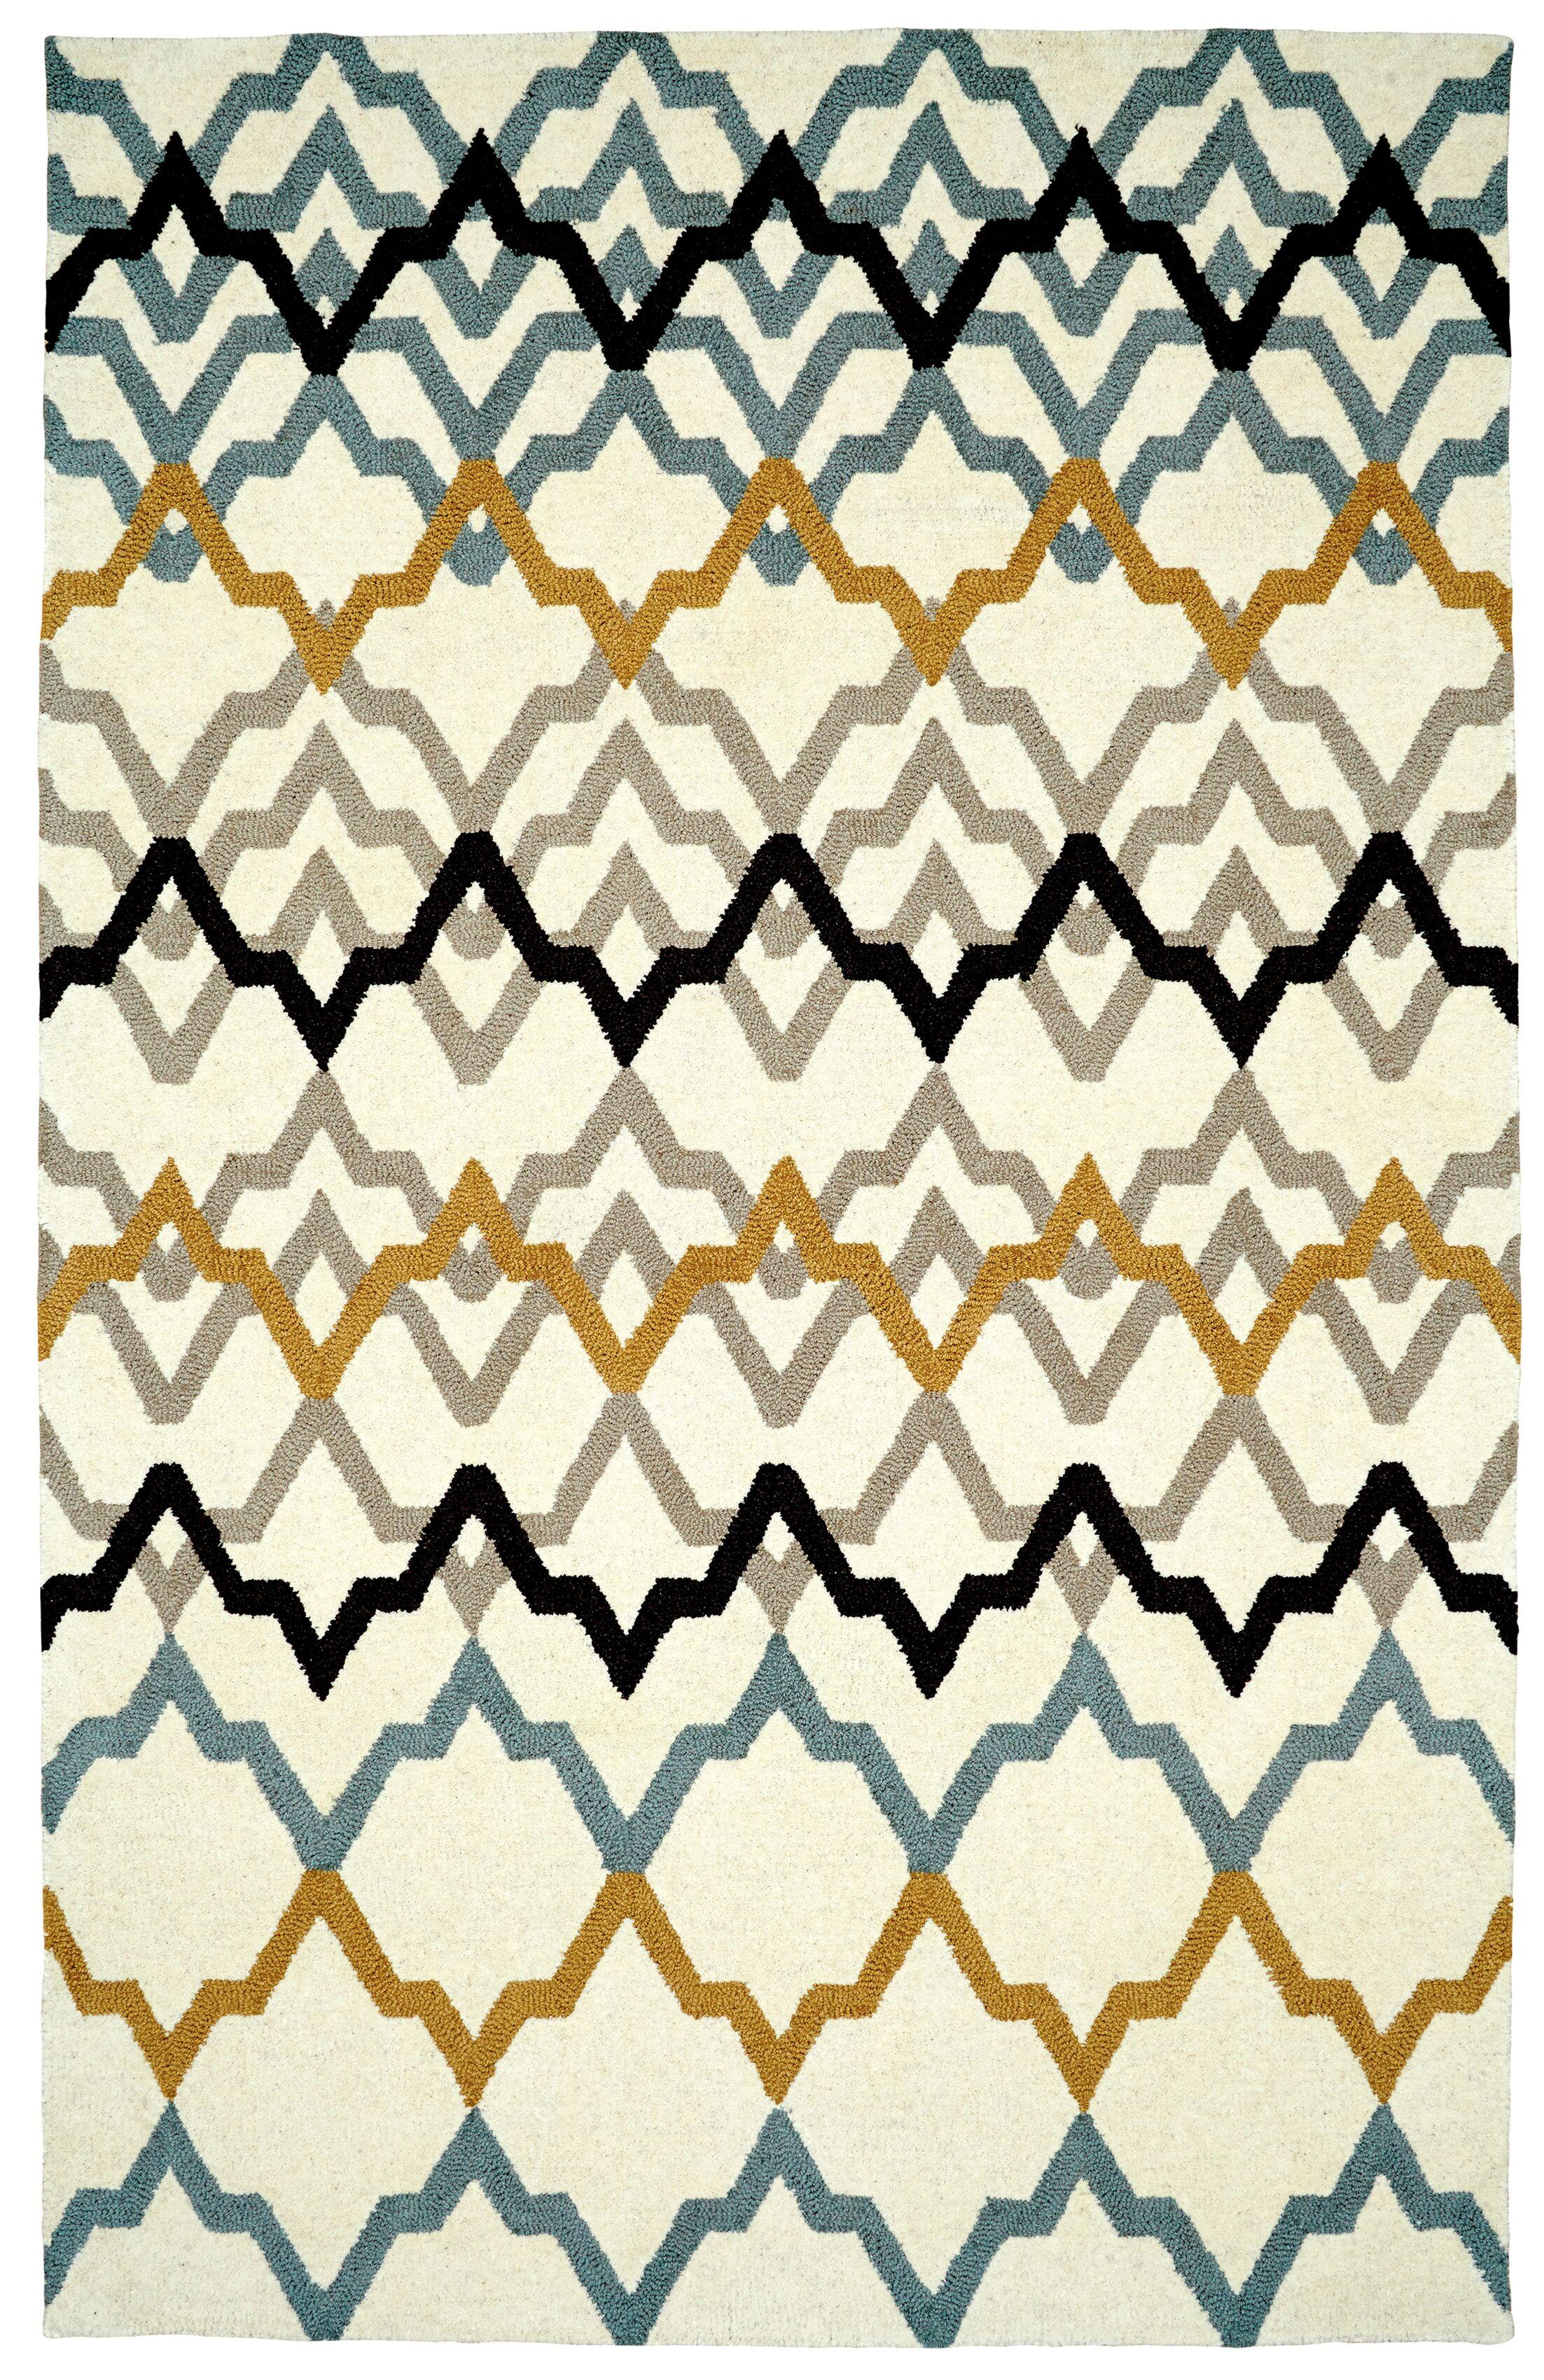 Rentz Ivory Area Rug Rug Size: Rectangle 8' x 11'